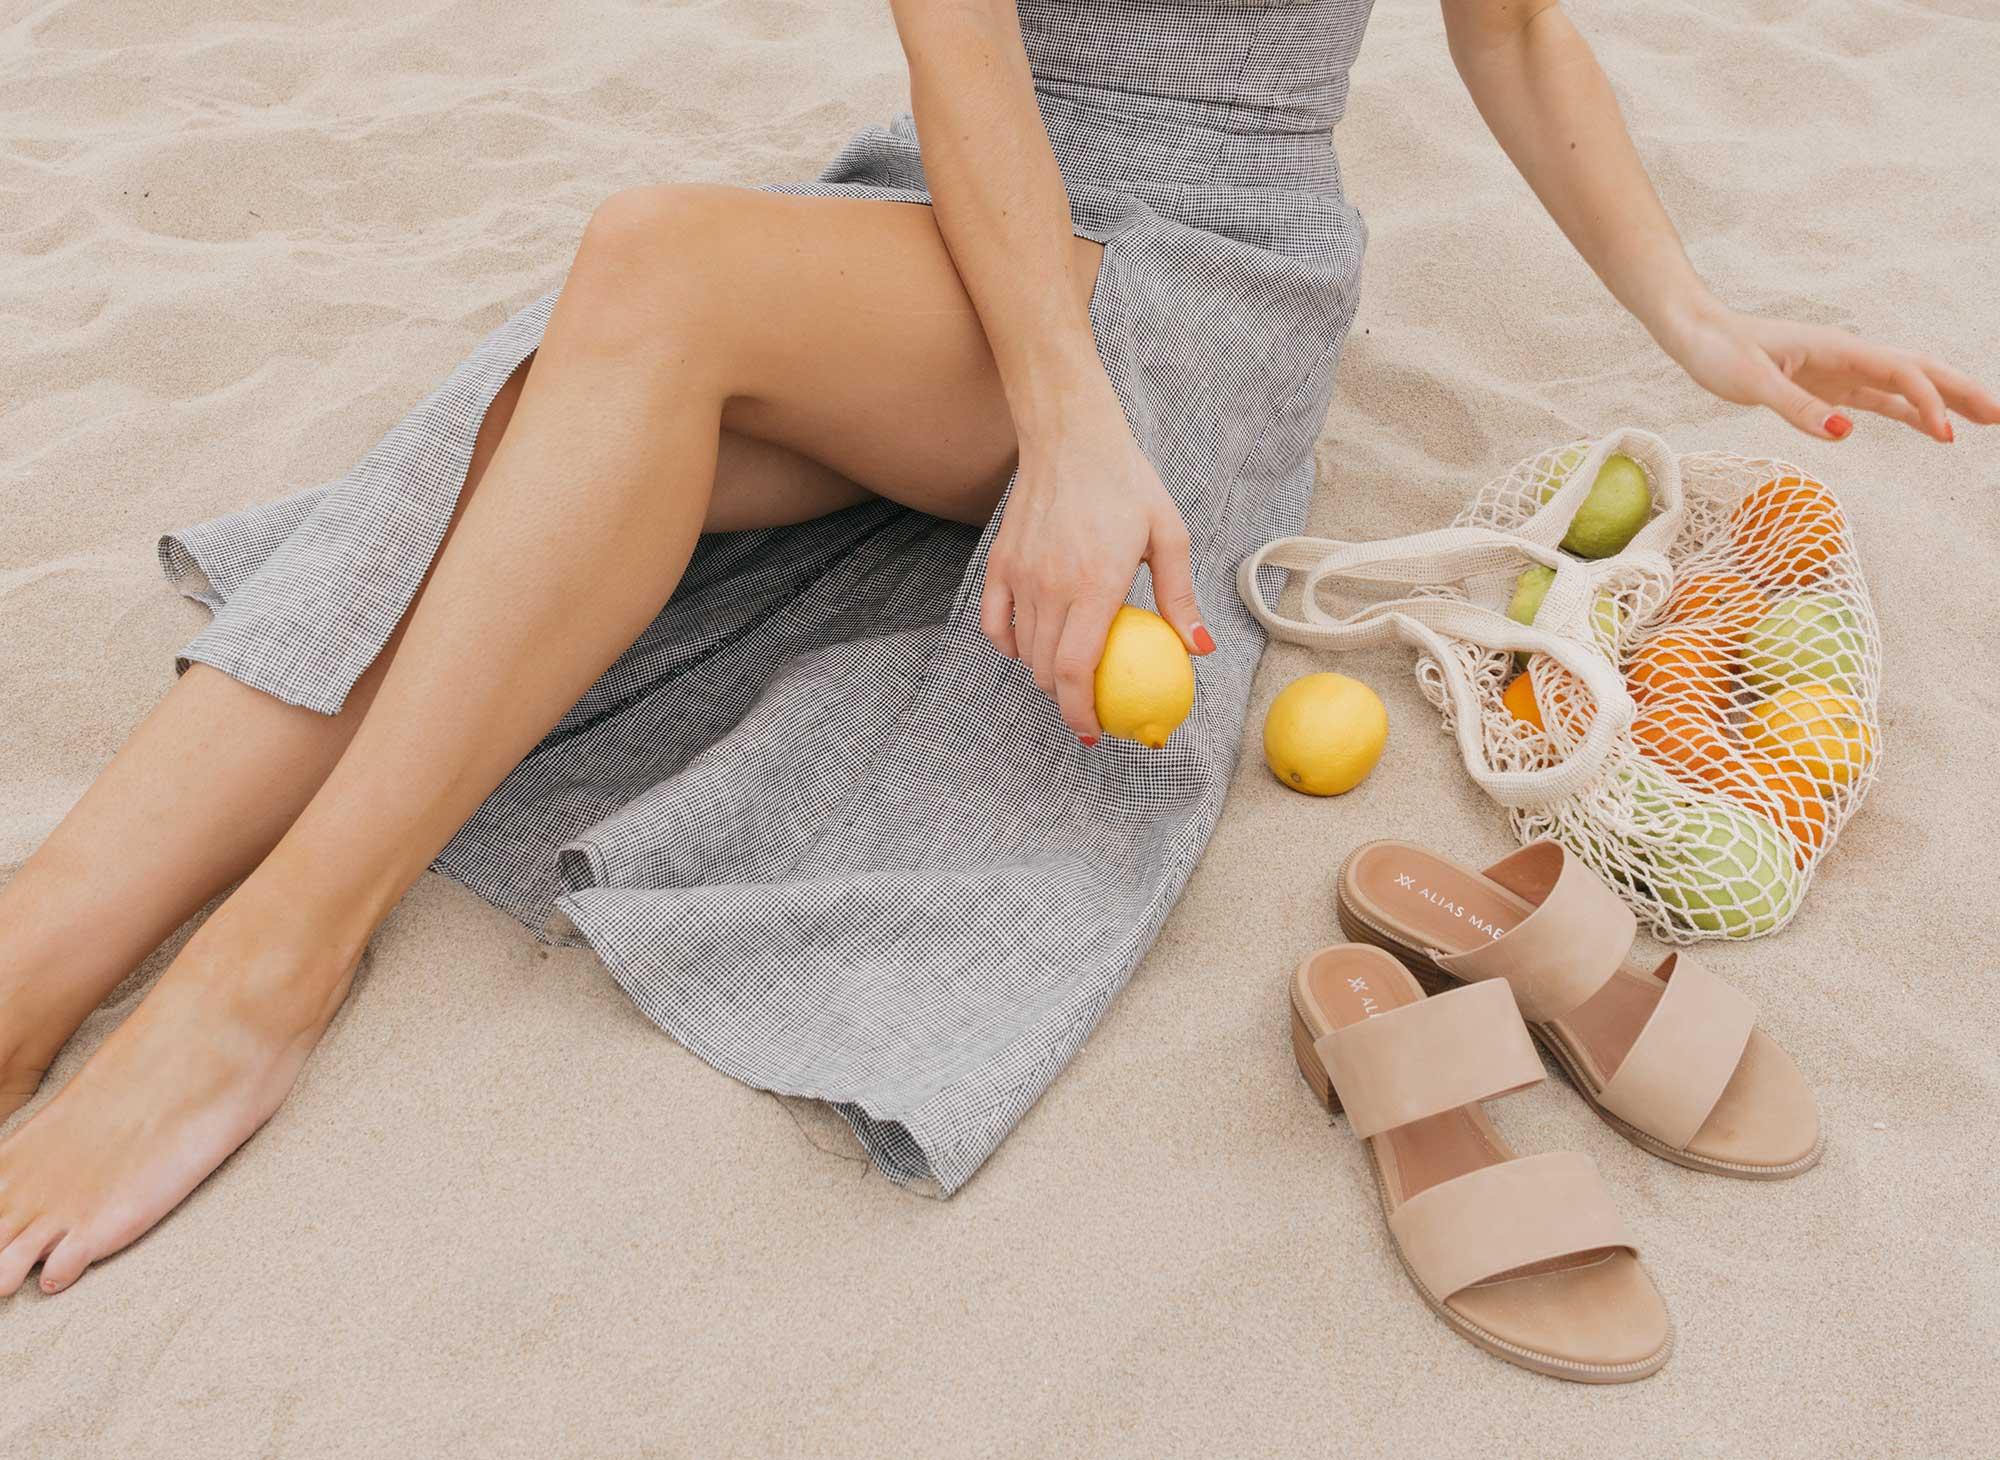 Reformation Lavendar Midi Dress Cotton Net Shopping Tote Newport Beach California Summer Outfit4.jpg